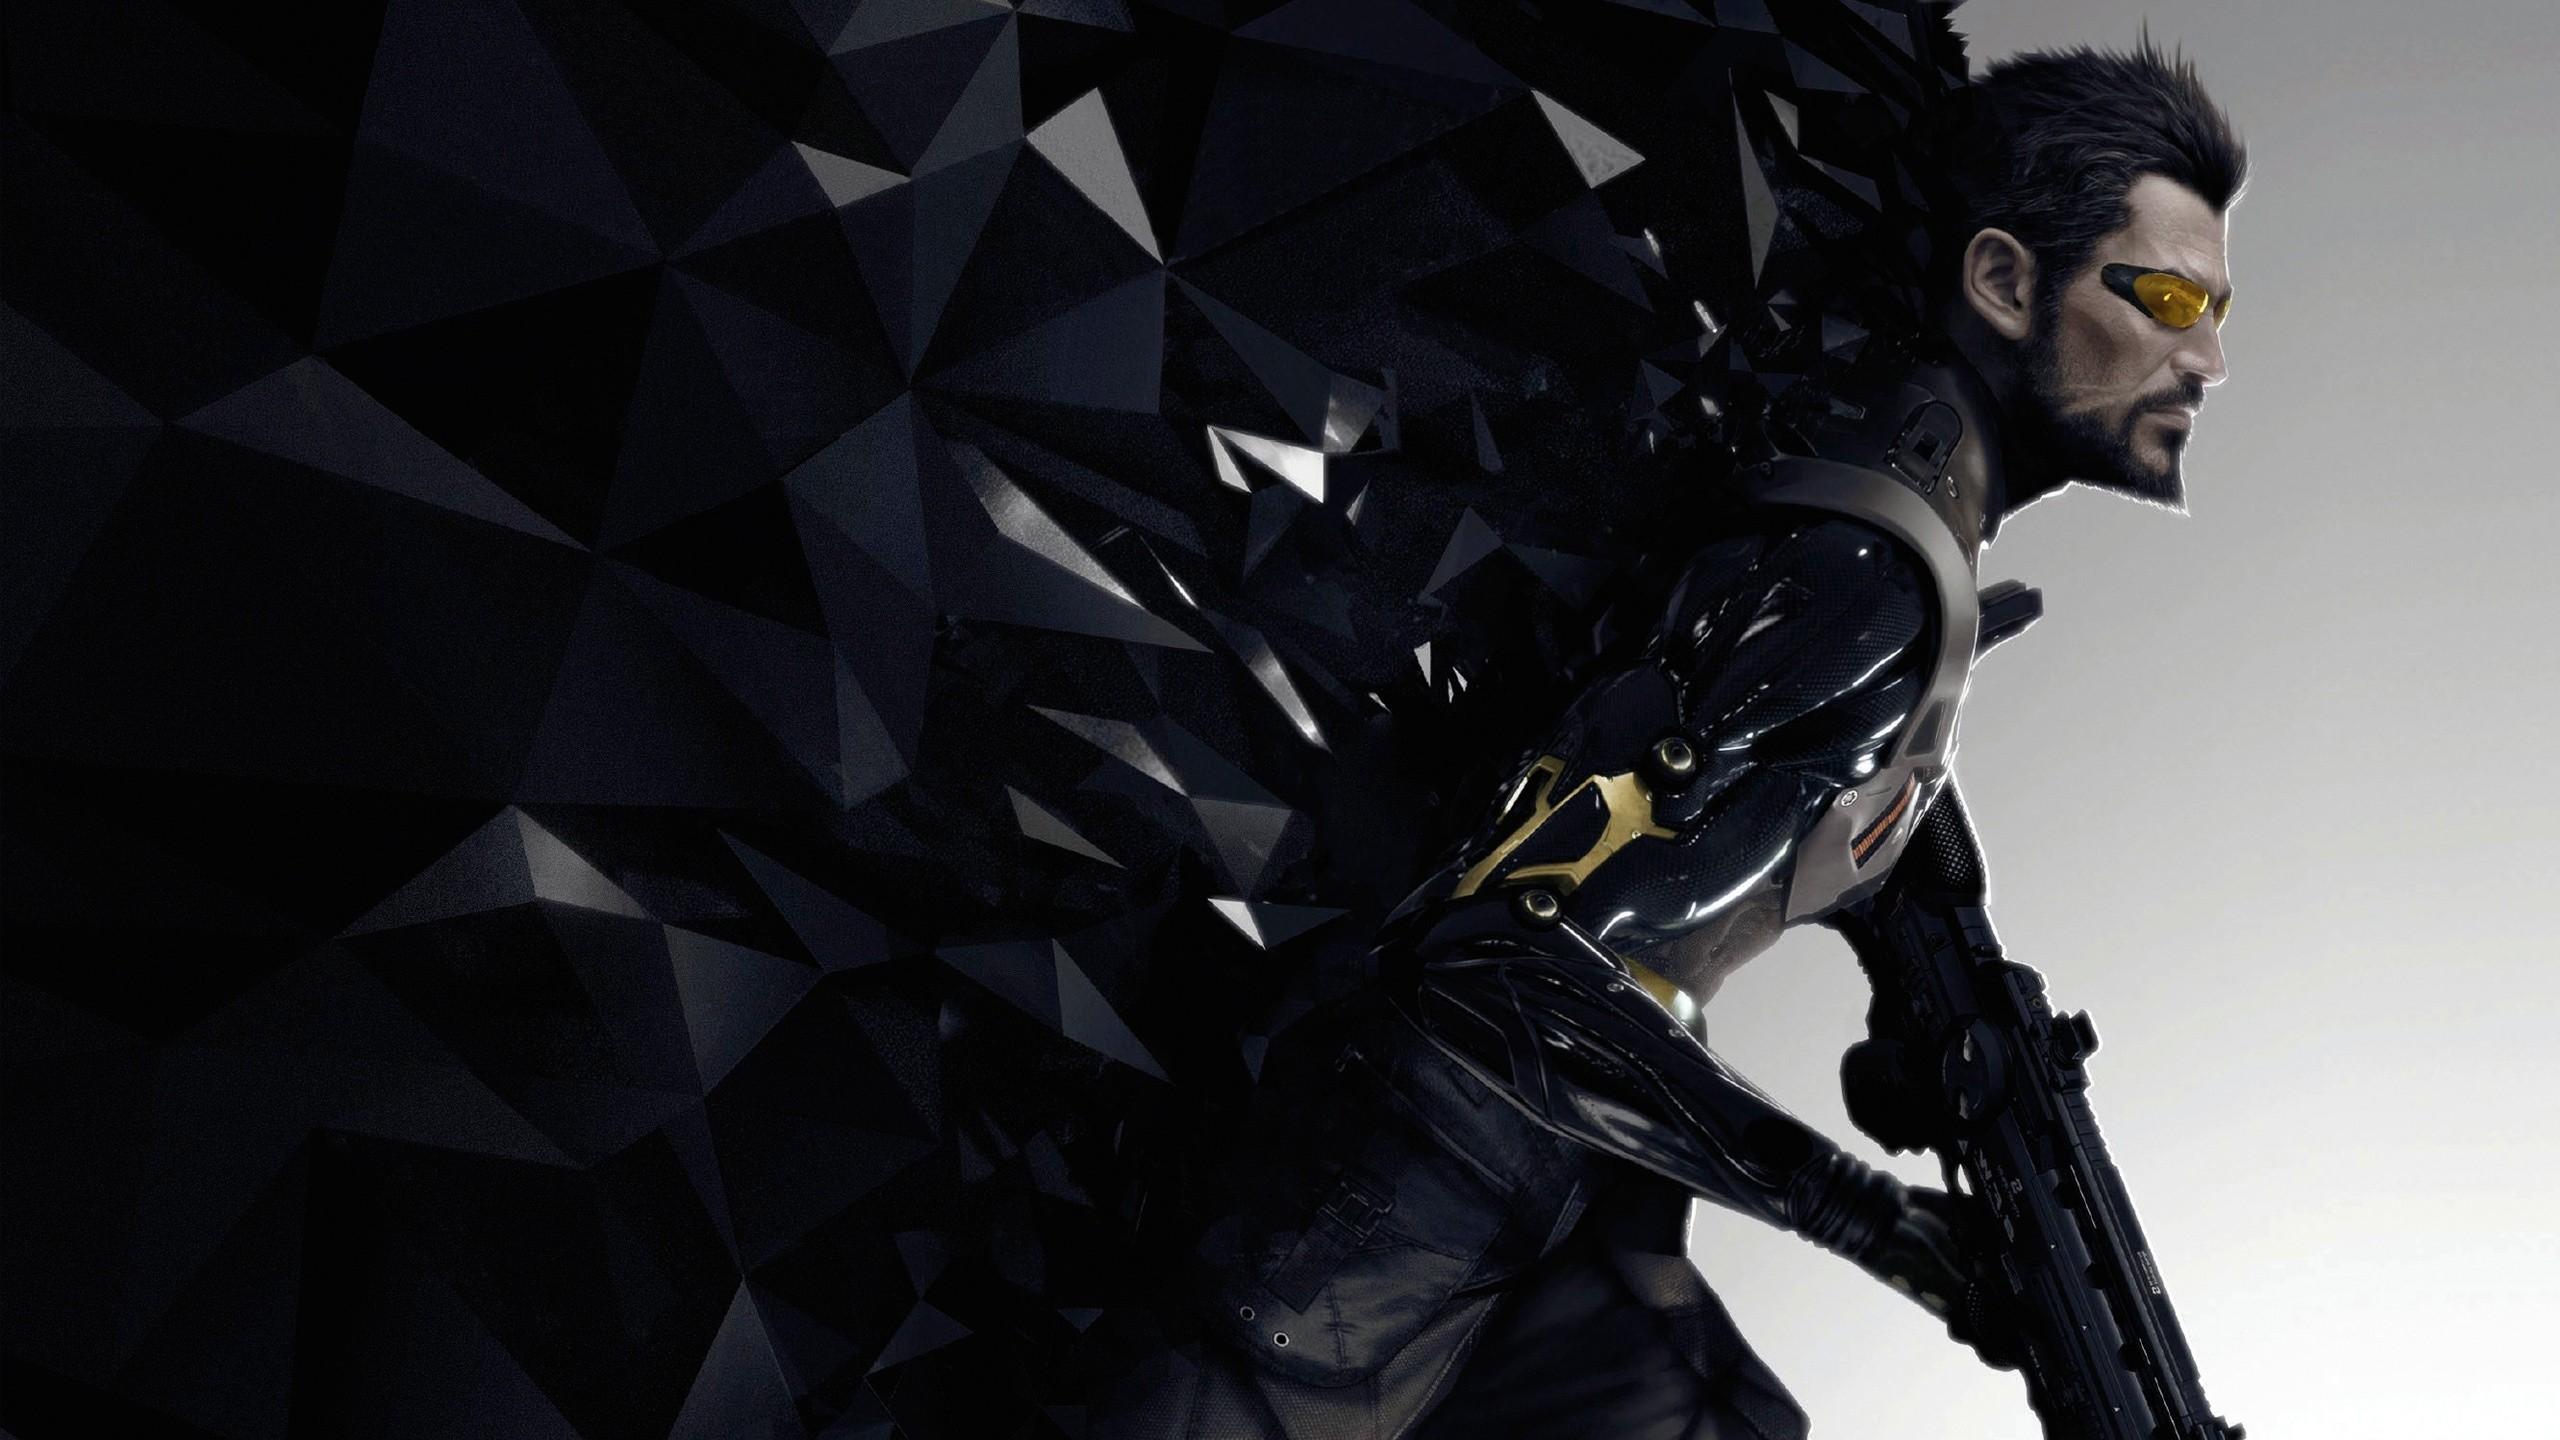 General 2560x1440 Deus Ex Deus Ex: Mankind Divided Square Enix Adam Jensen video games PC gaming science fiction video game art weapon men